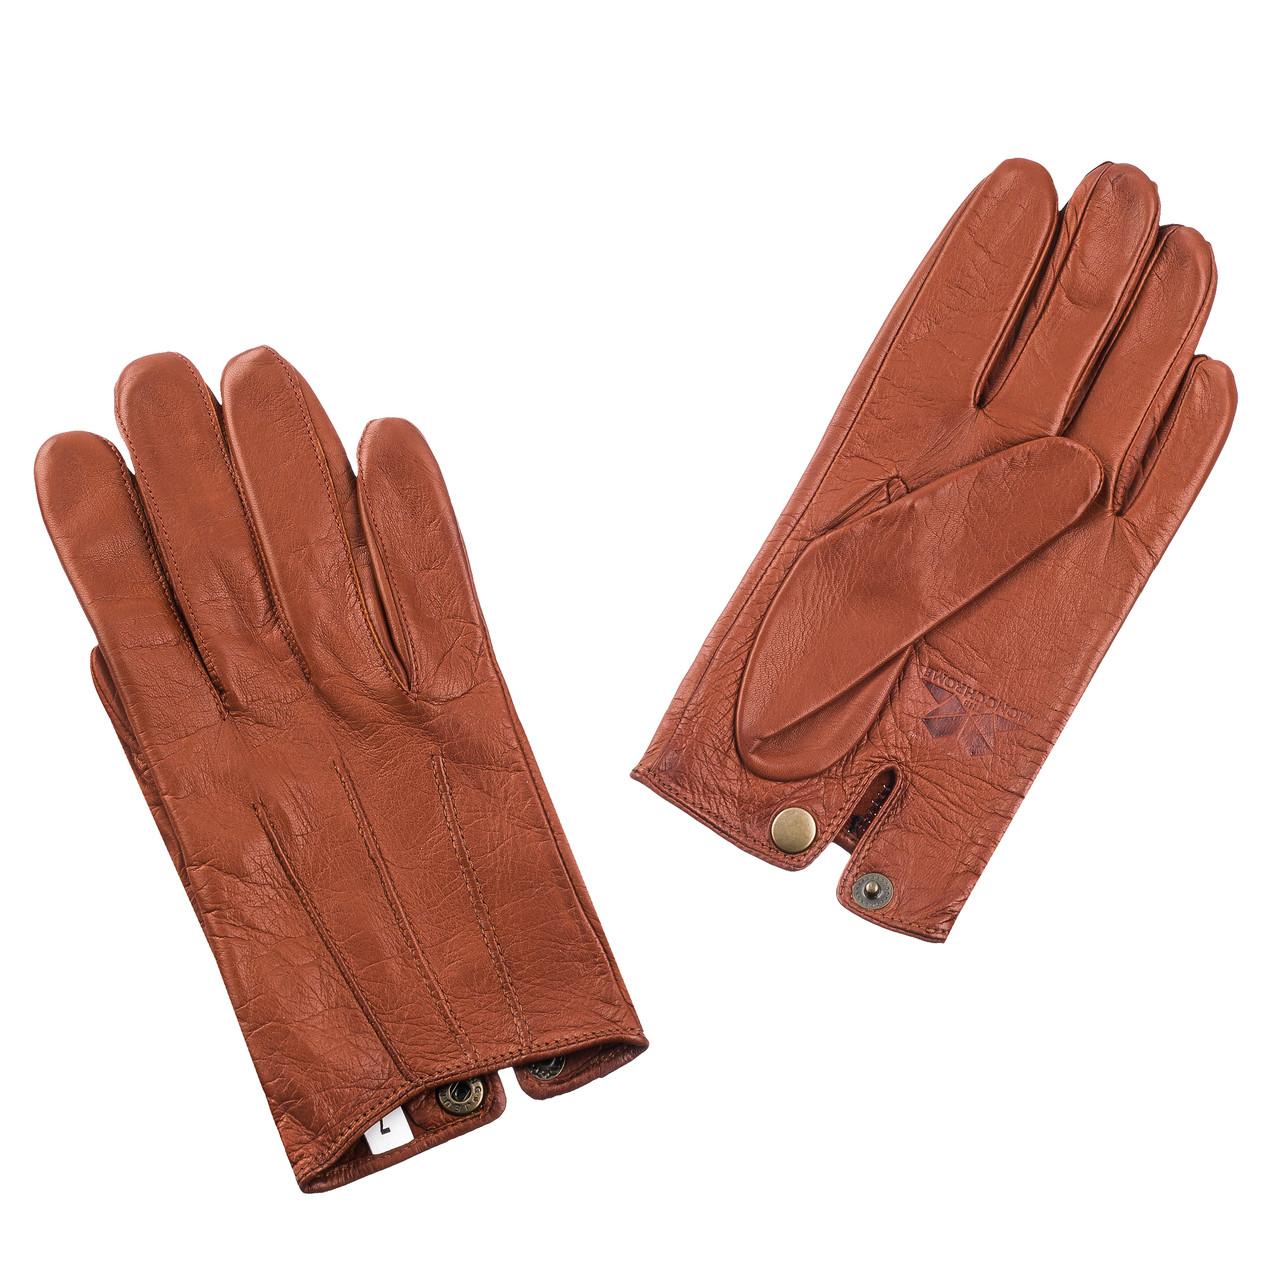 Перчатки The Monochrome 7 кожаные  Коричневые (SS_1868i)